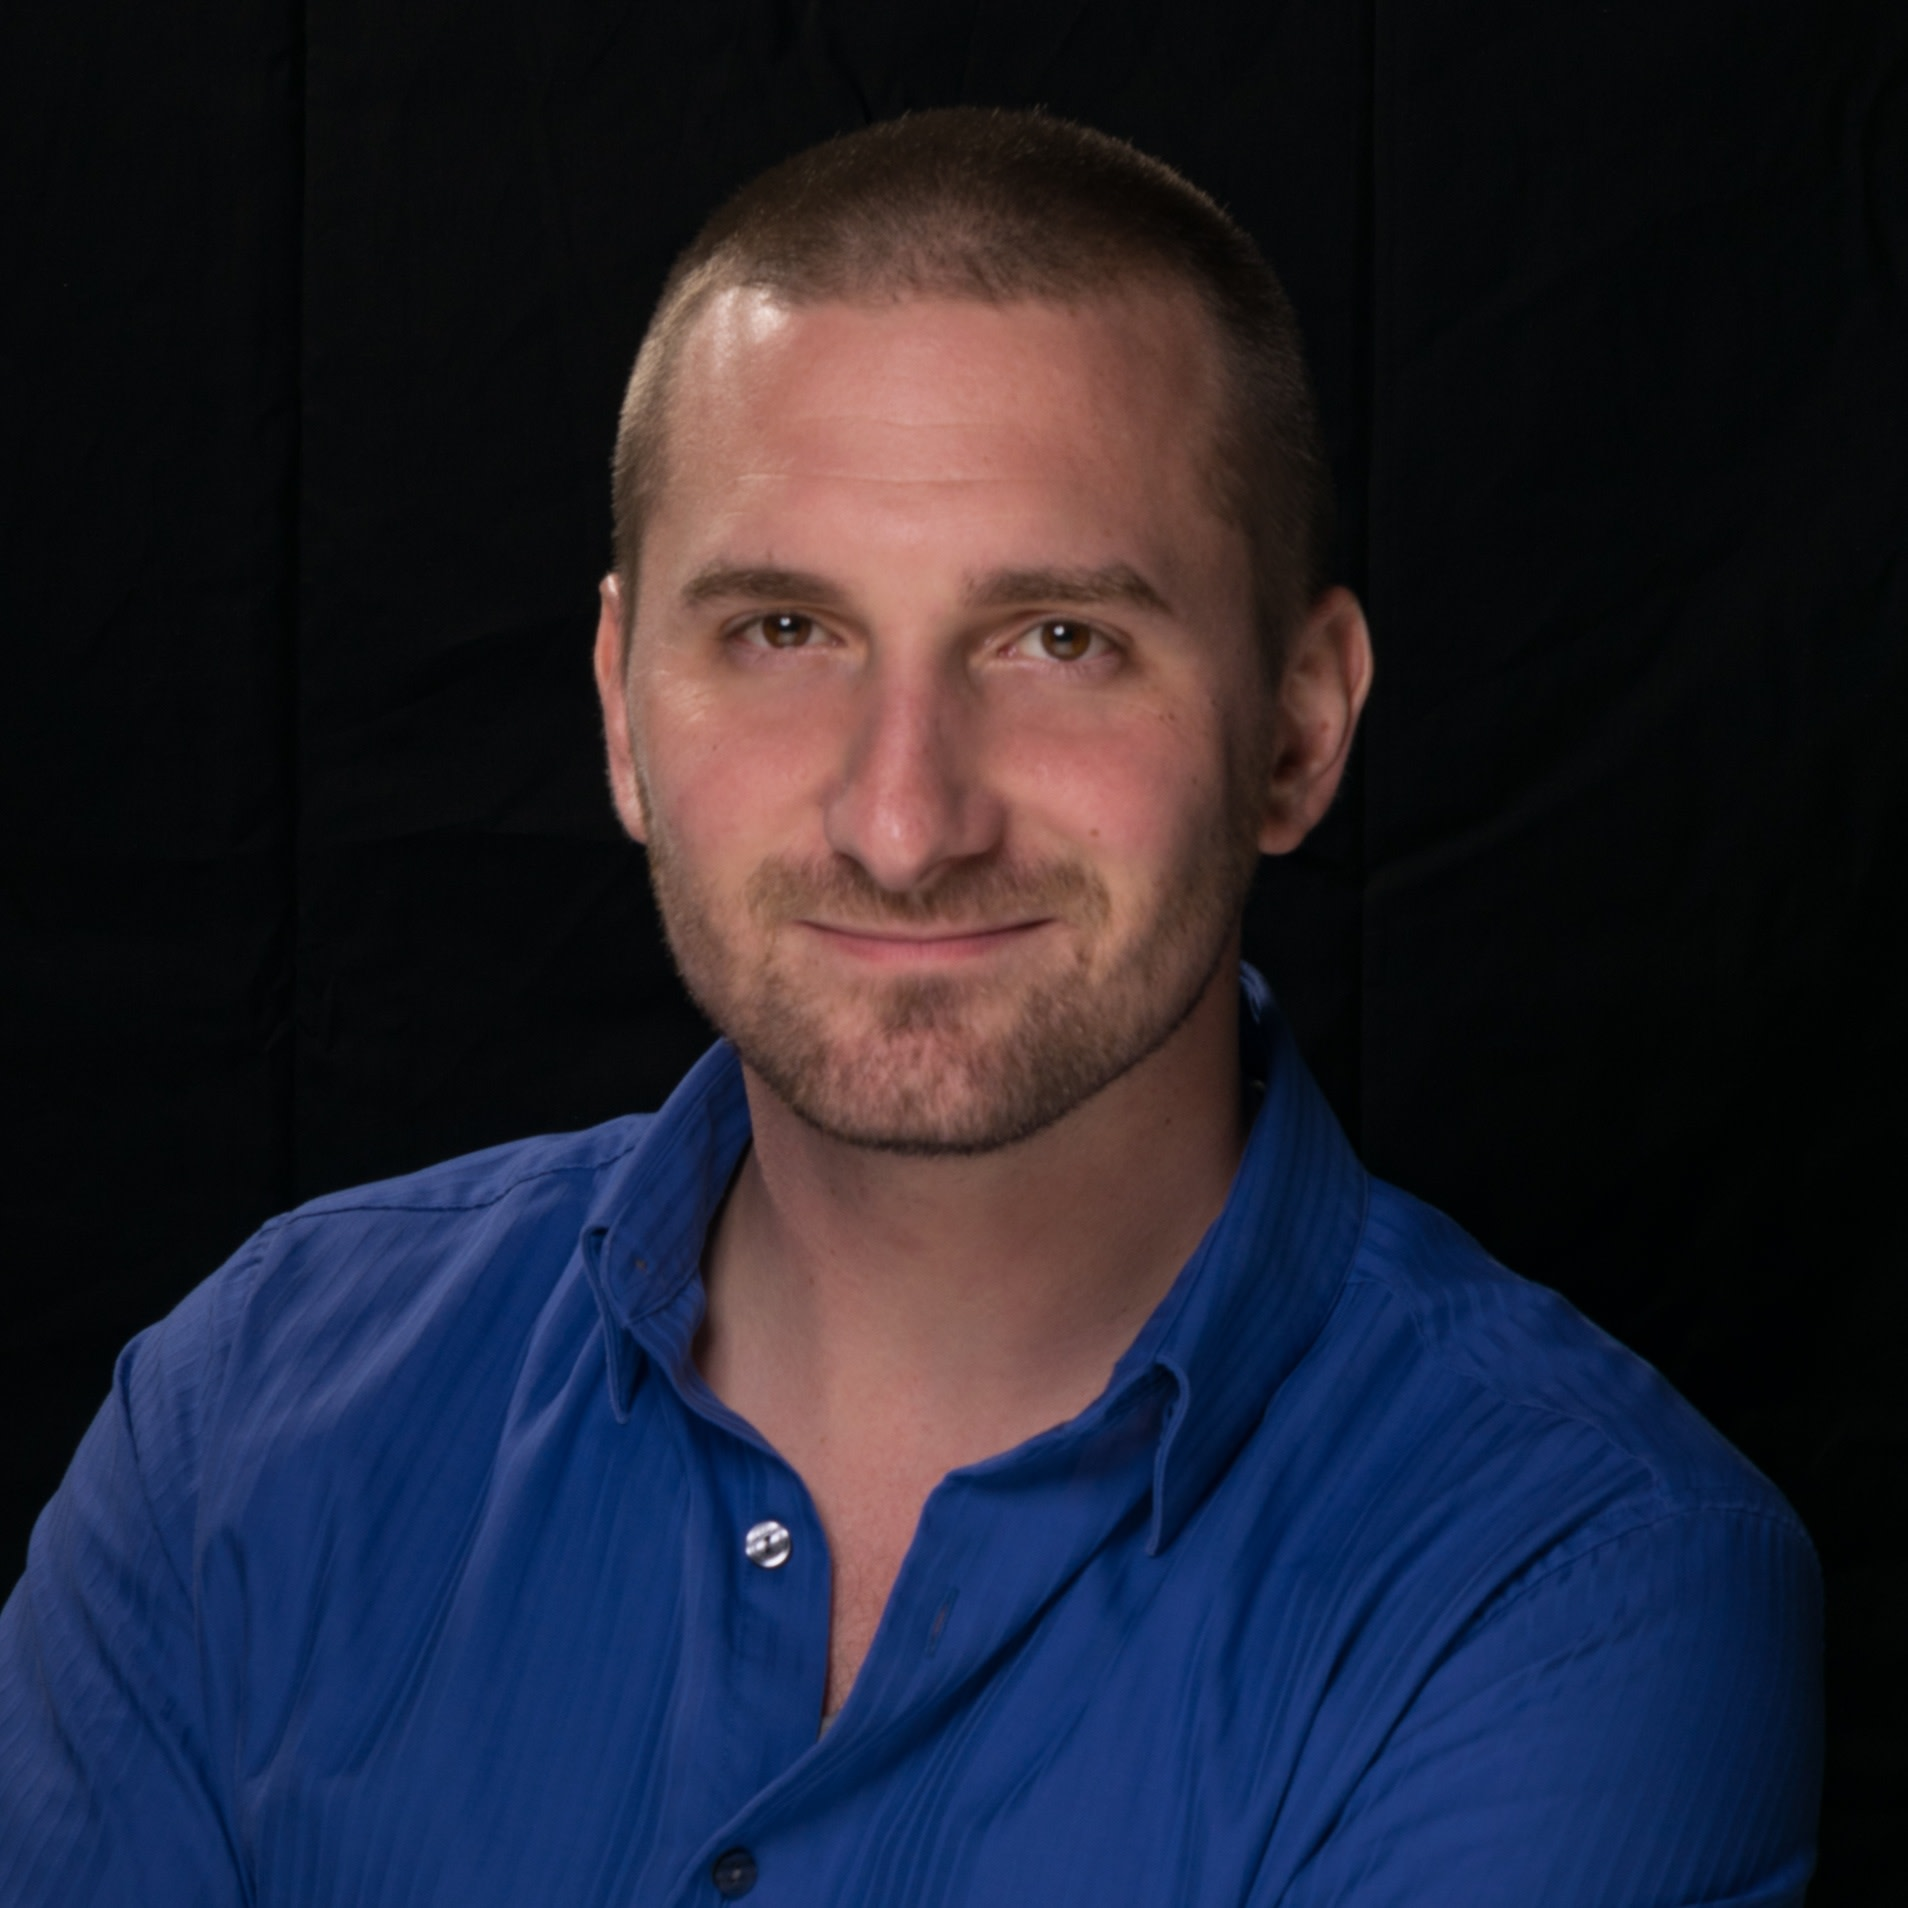 The Damage Report With John Iadarola - TYT.com